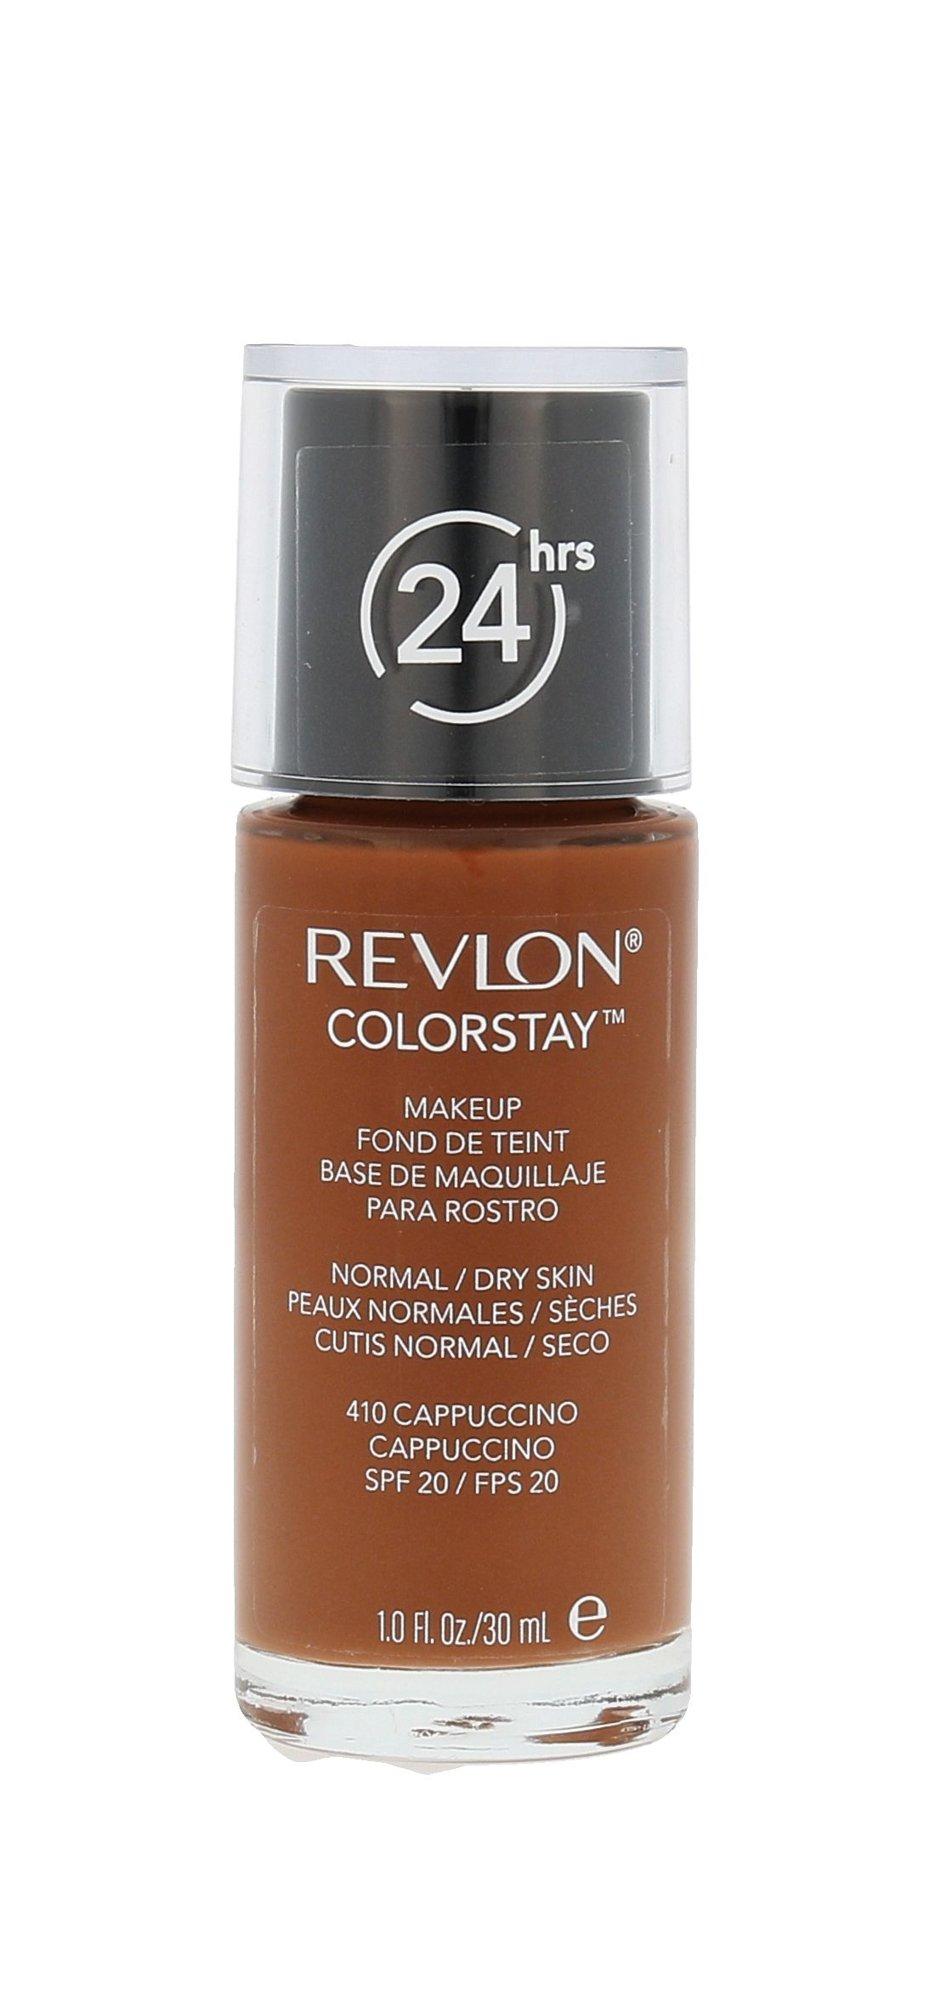 Revlon Colorstay Cosmetic 30ml 410 Cappuccino